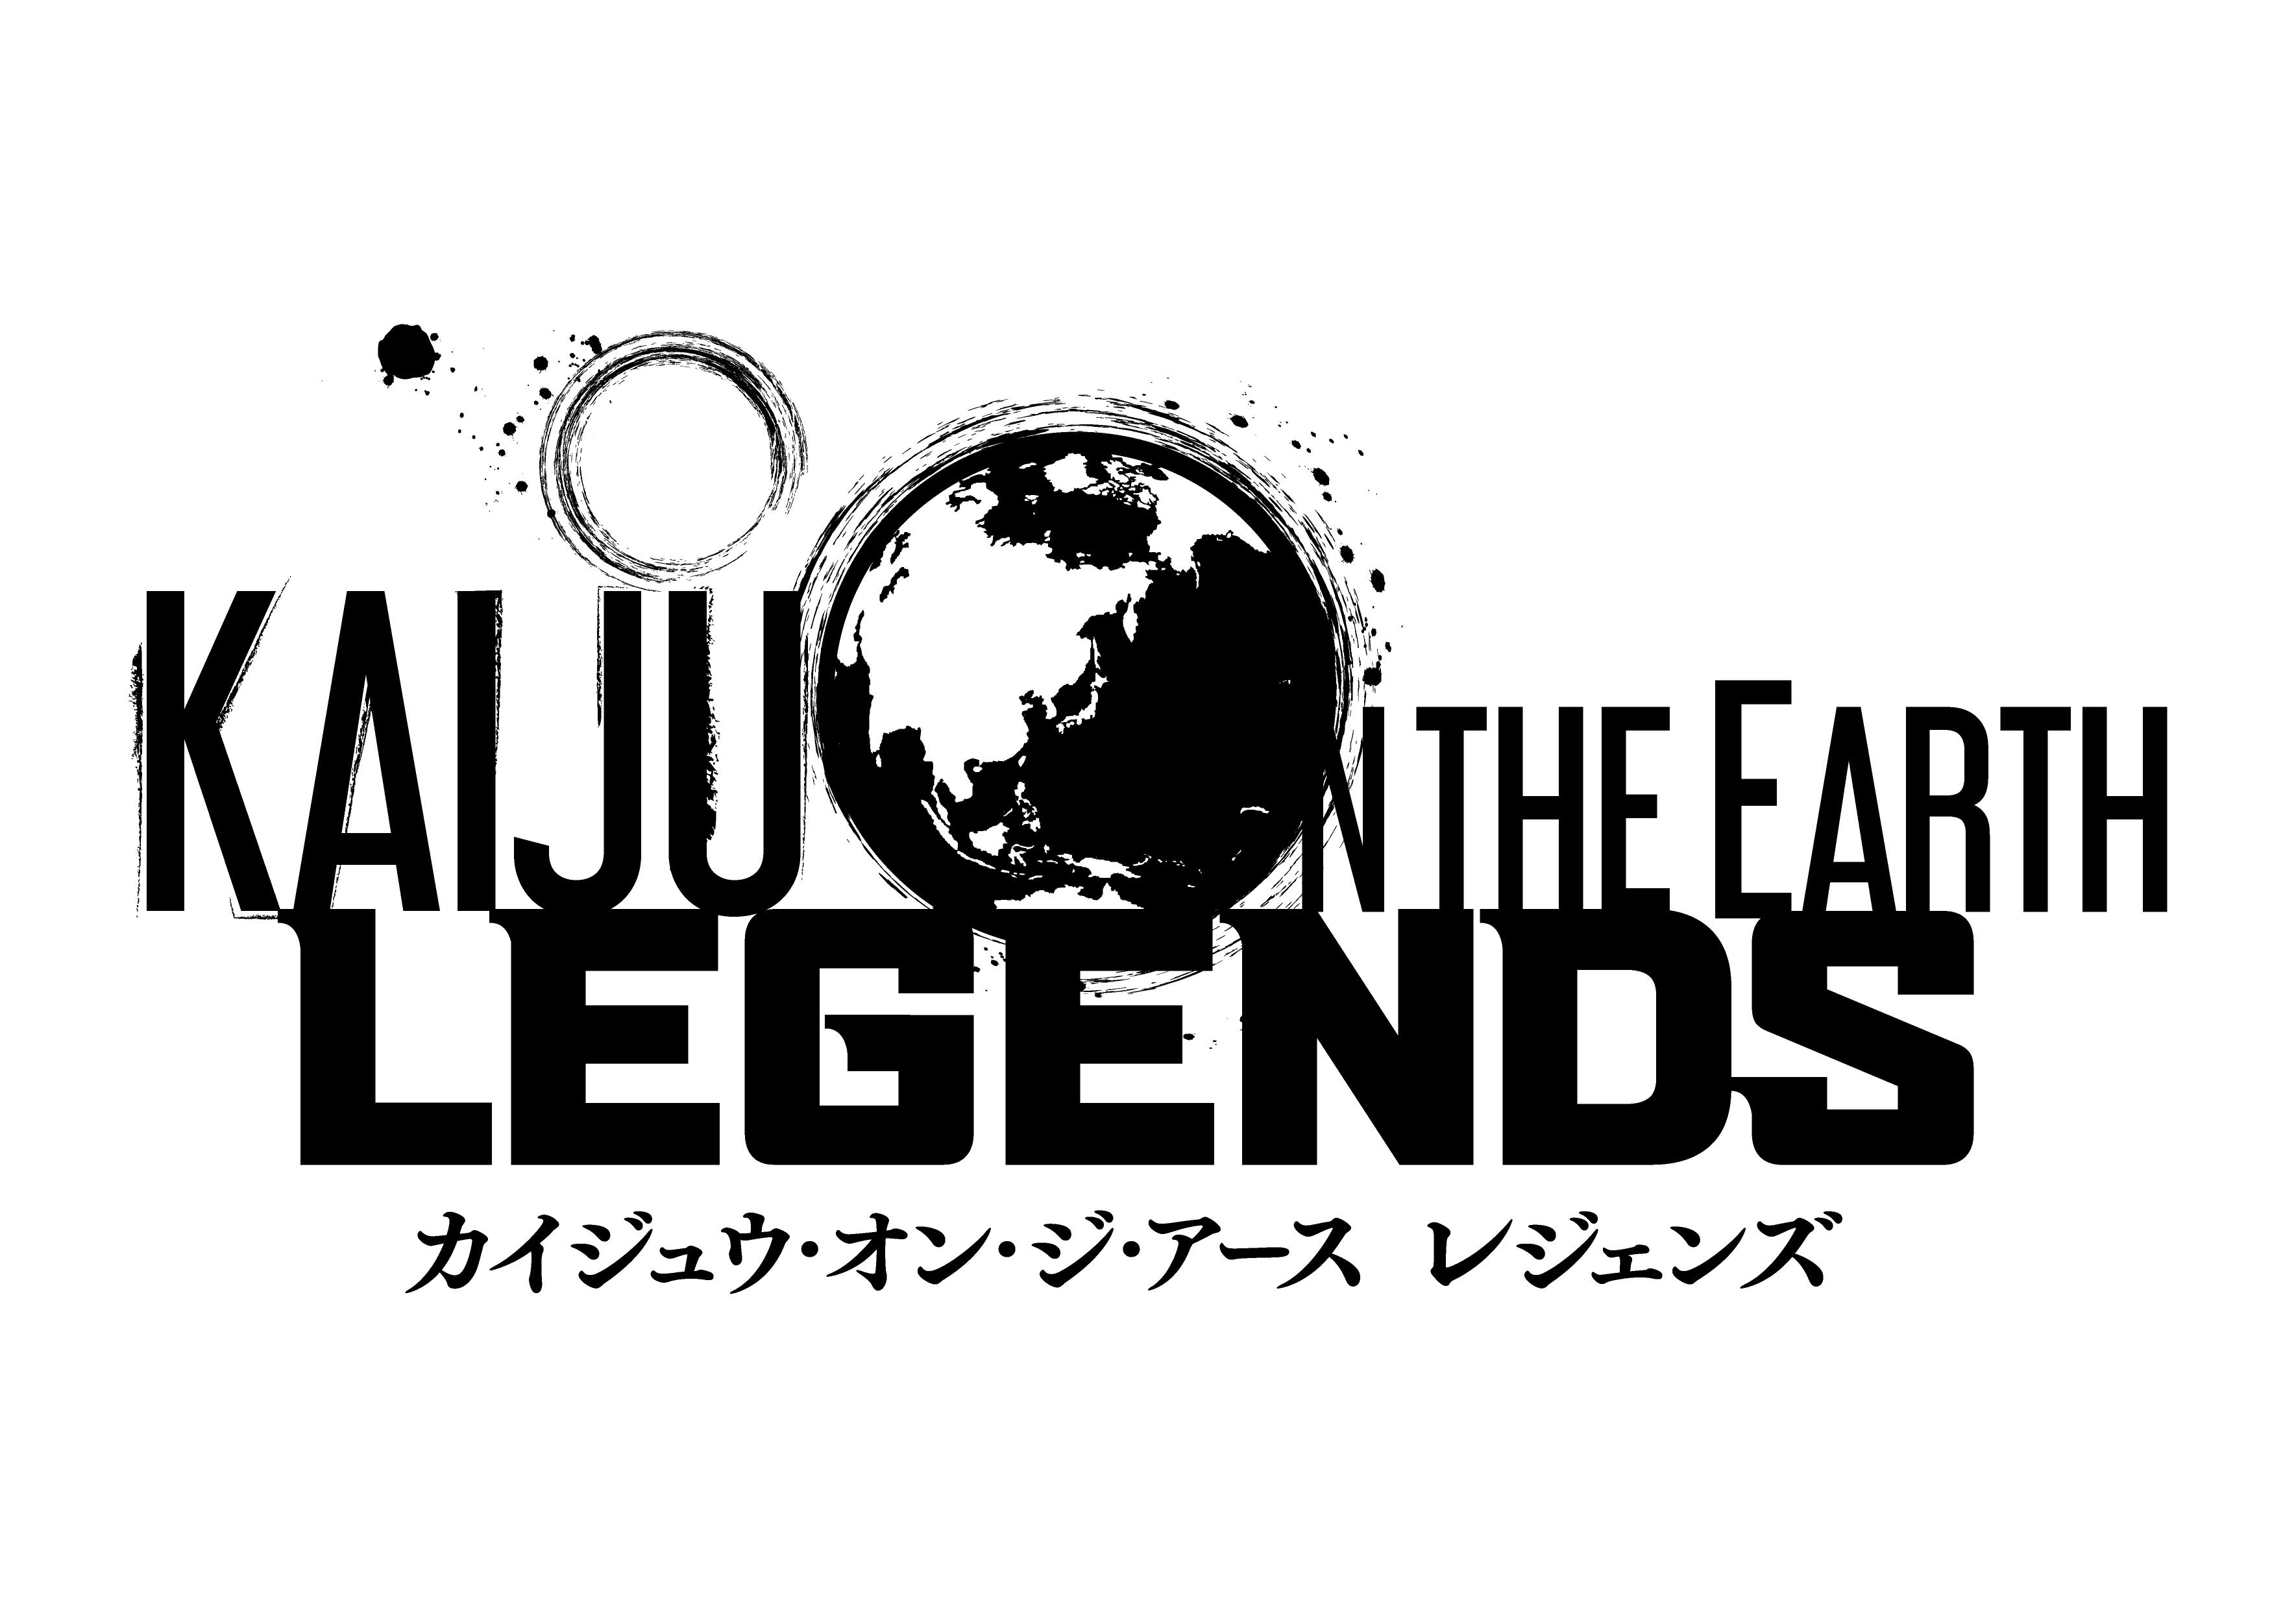 kaiju-on-the-earth-legends-4-2